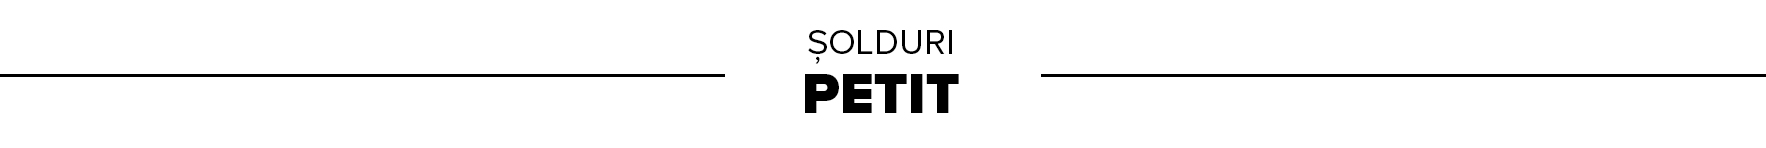 Solduri Petit